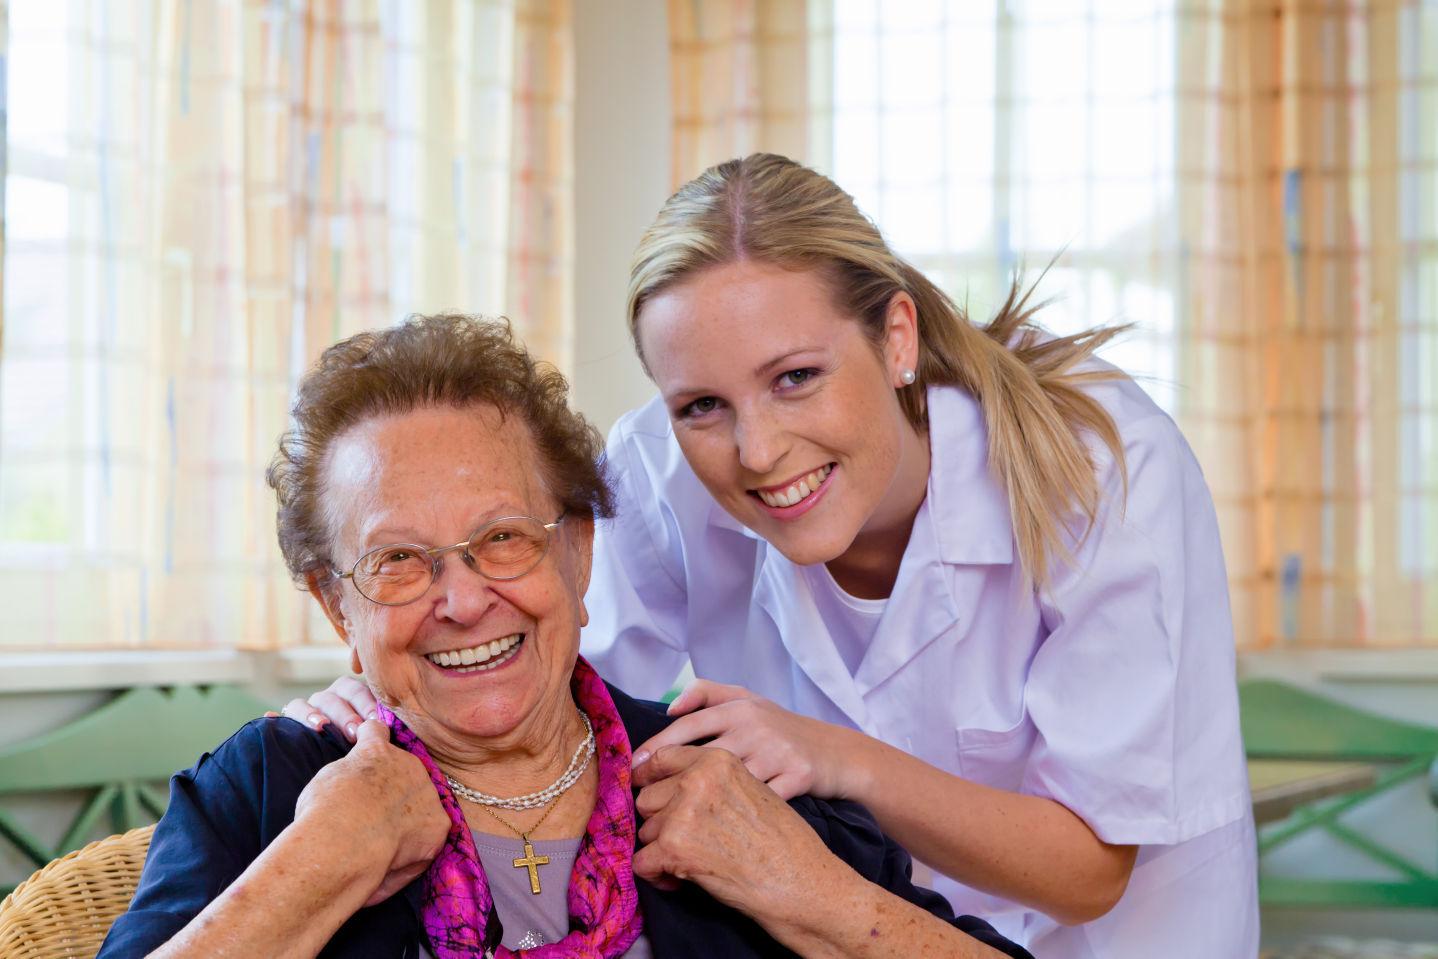 nursing shortage creates career opportunities at senior living rh wcfcourier com